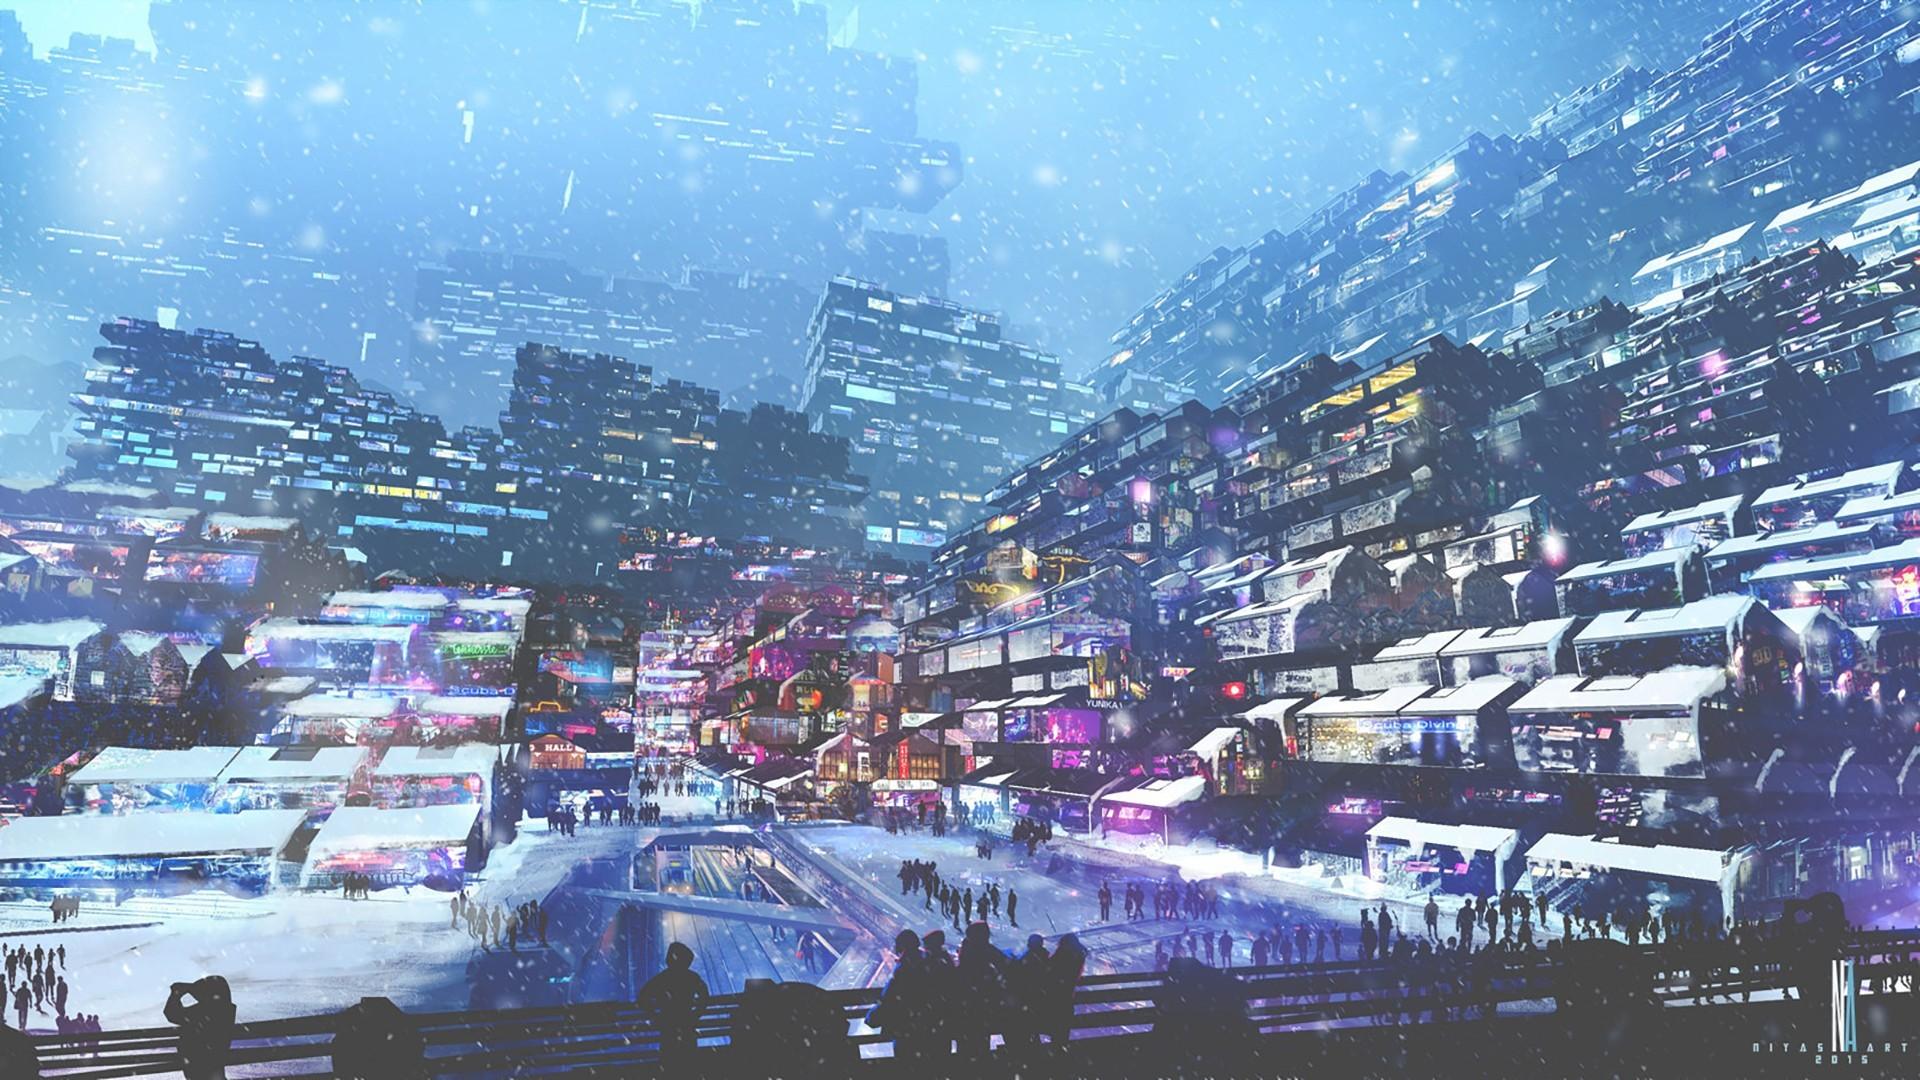 artwork, Digital Art, City, Futuristic, Cyberpunk, Snow, Lights, People, Winter  Wallpapers HD / Desktop and Mobile Backgrounds